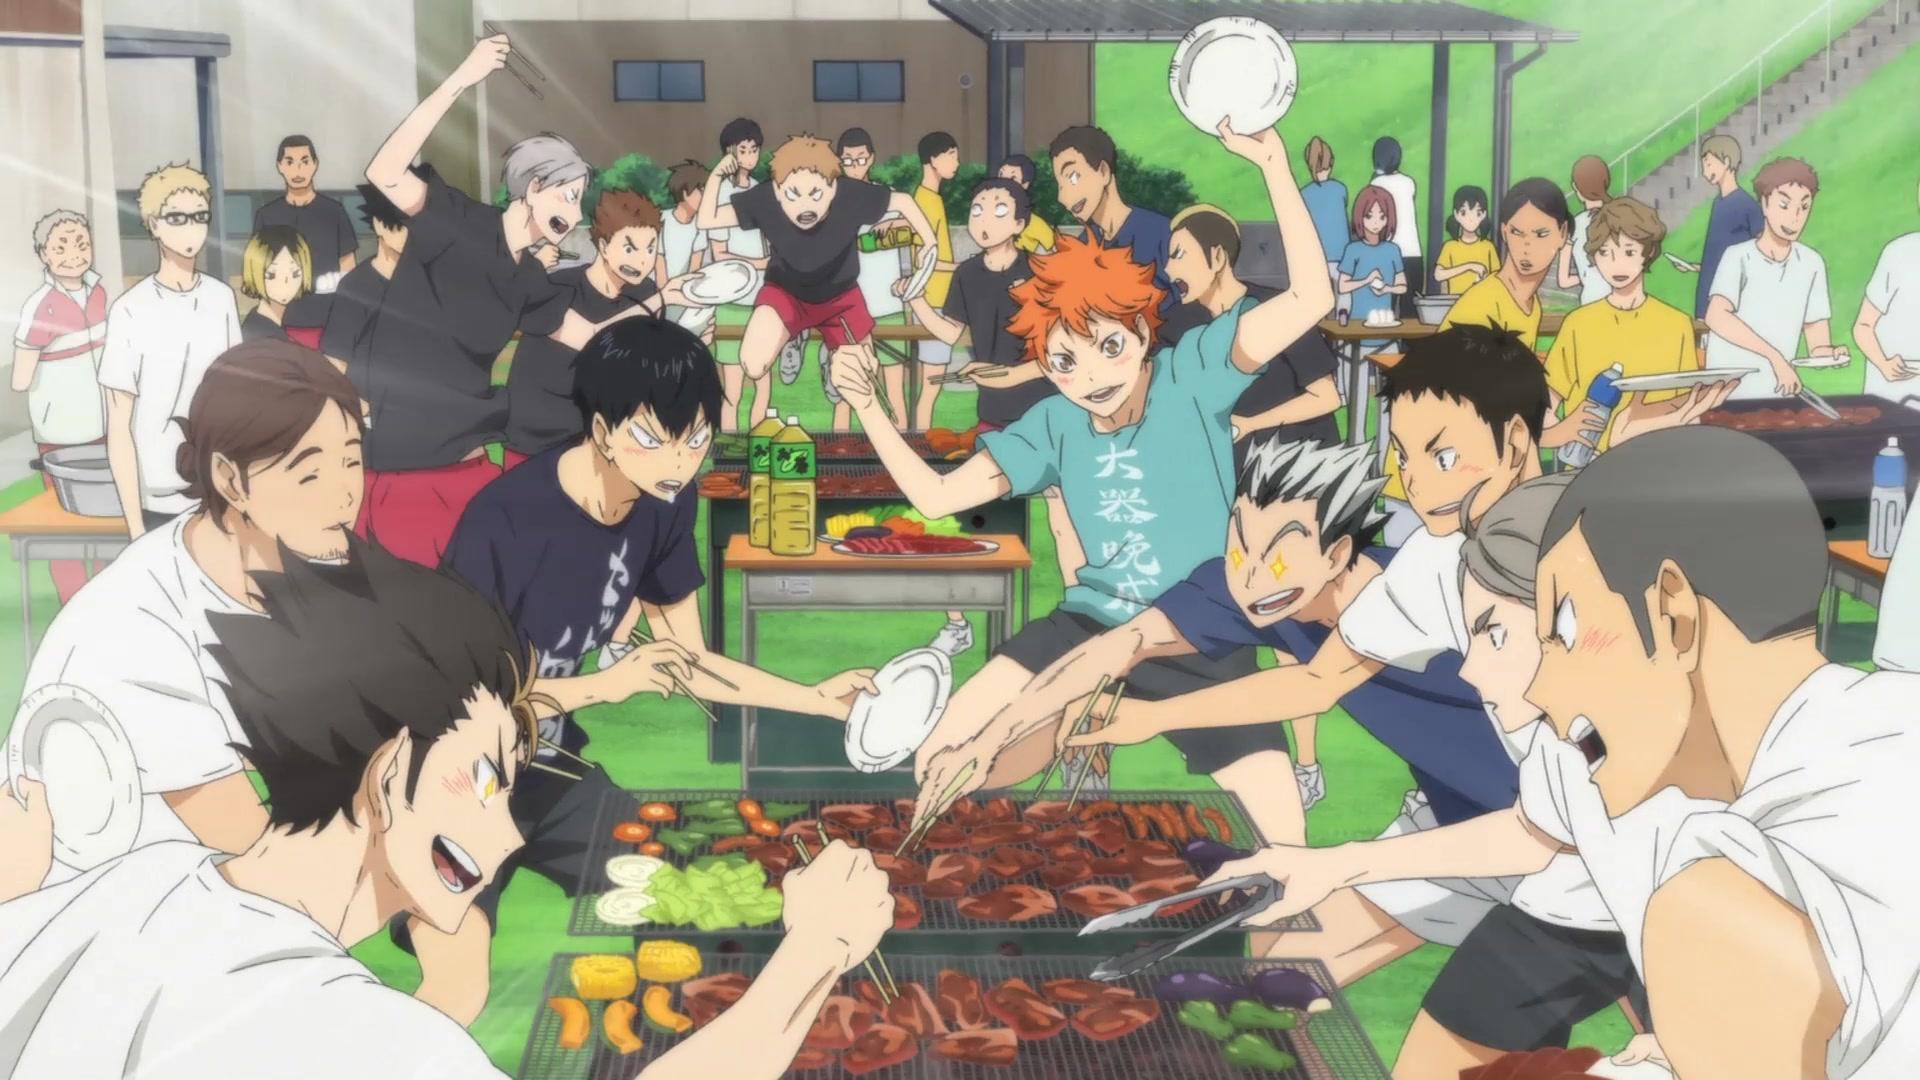 Tokyo Training Camp arc in Season 2 of Haikyuu!! Photo from Production I.G